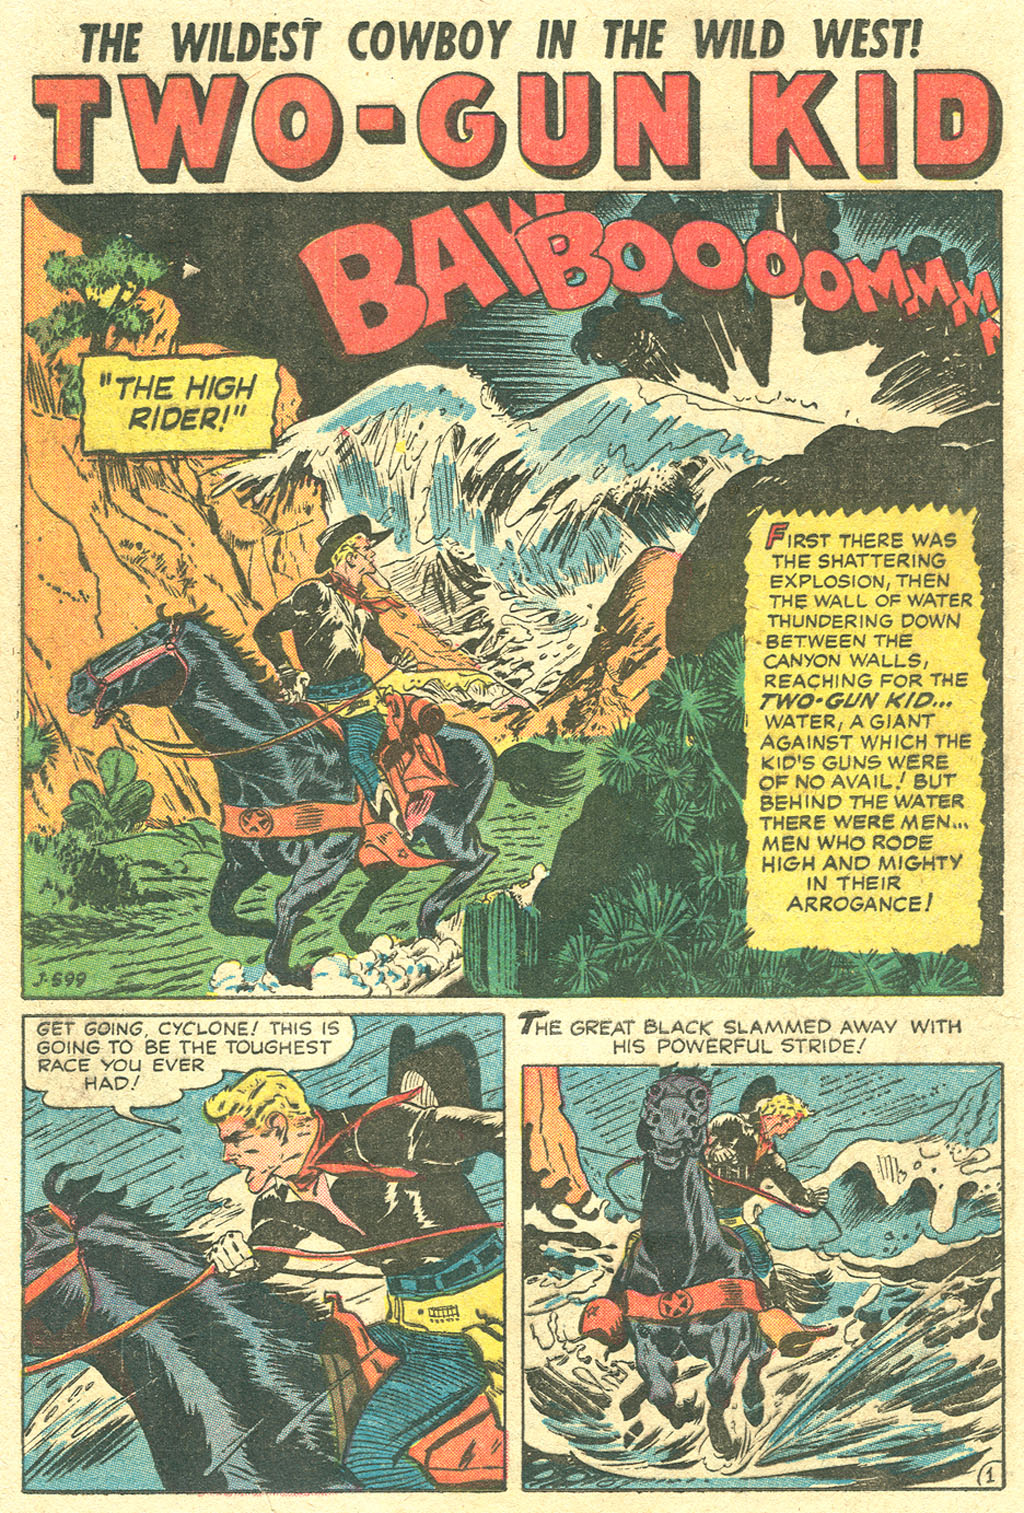 Read online Two-Gun Kid comic -  Issue #32 - 16